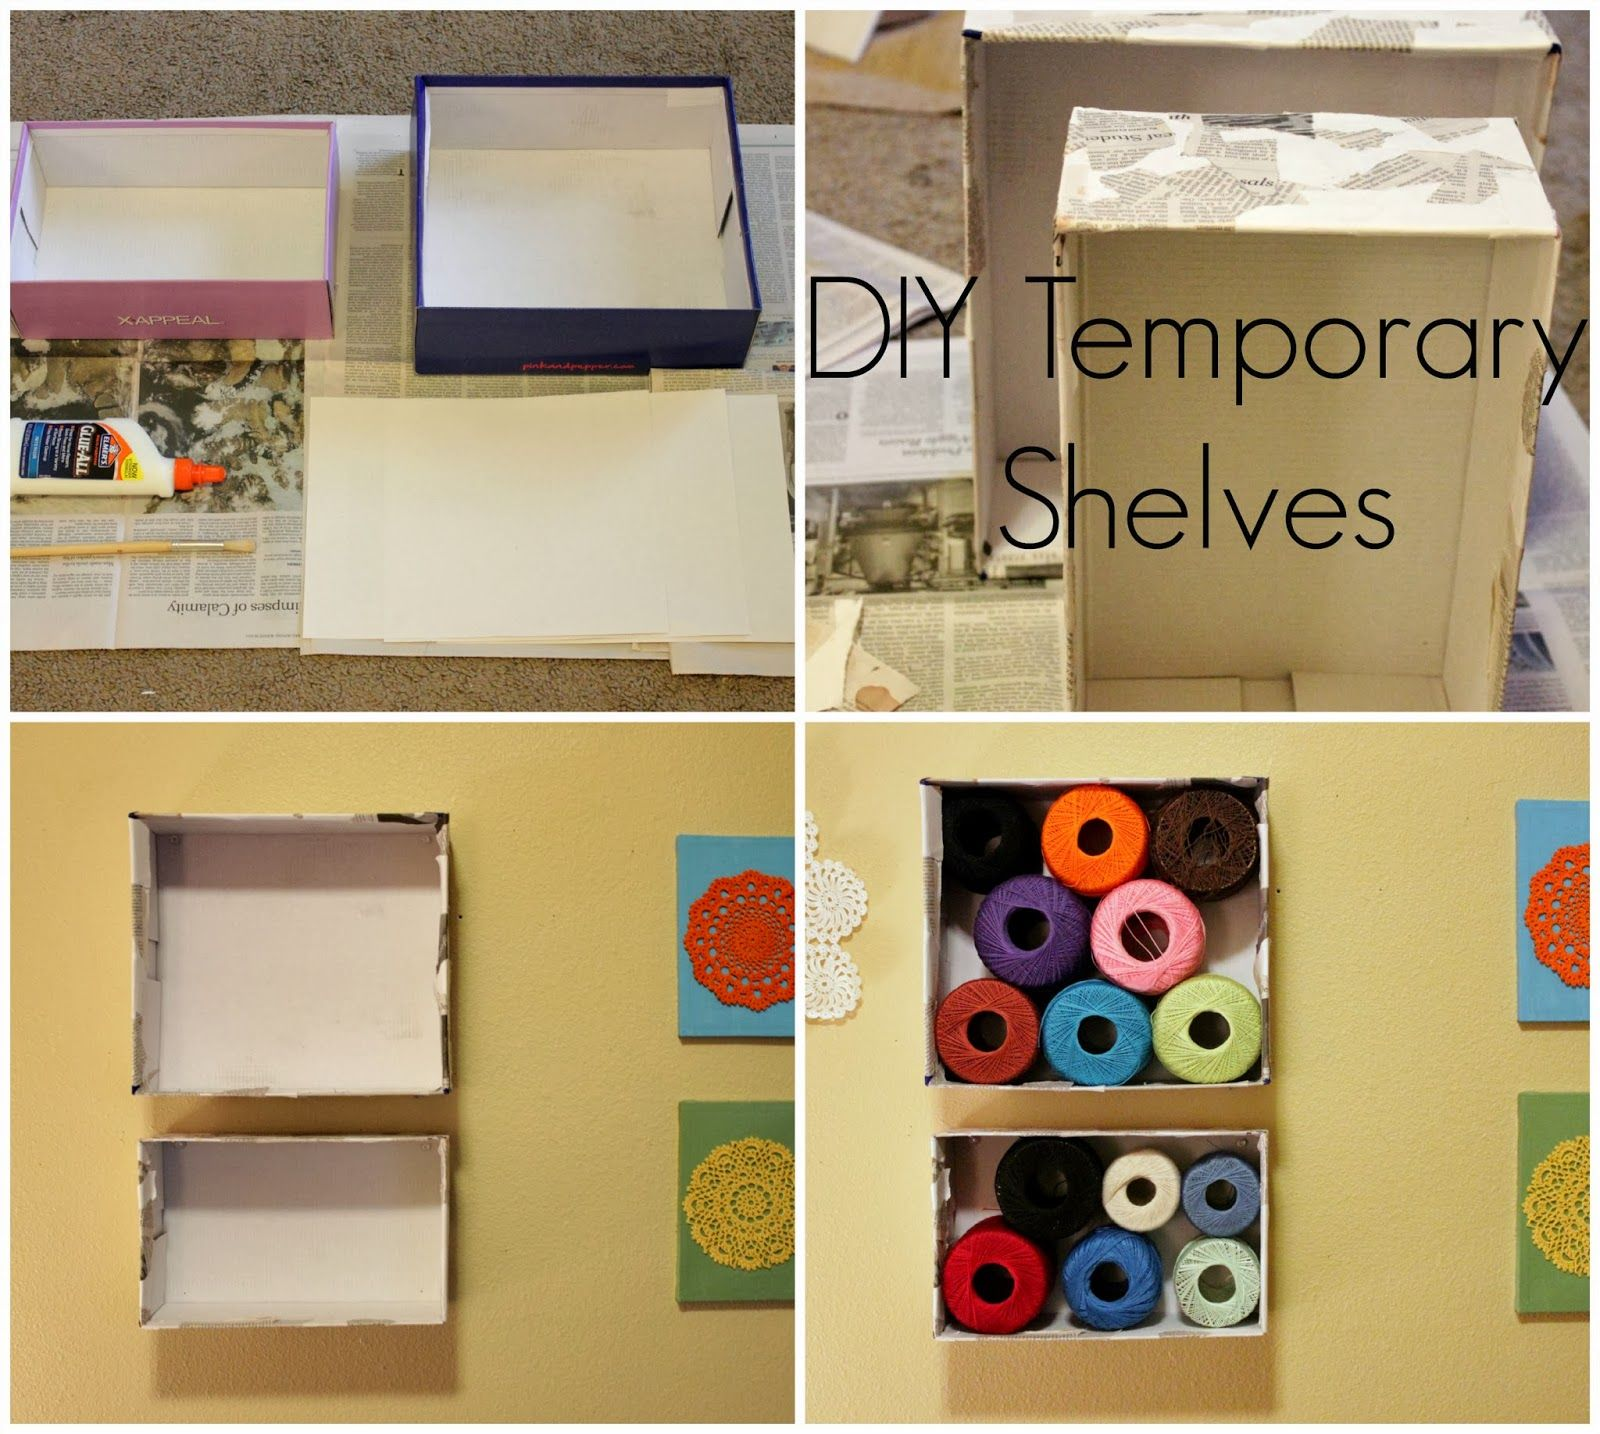 DIY Temporary Shelves | Shelves, Apartments and Apartment ideas